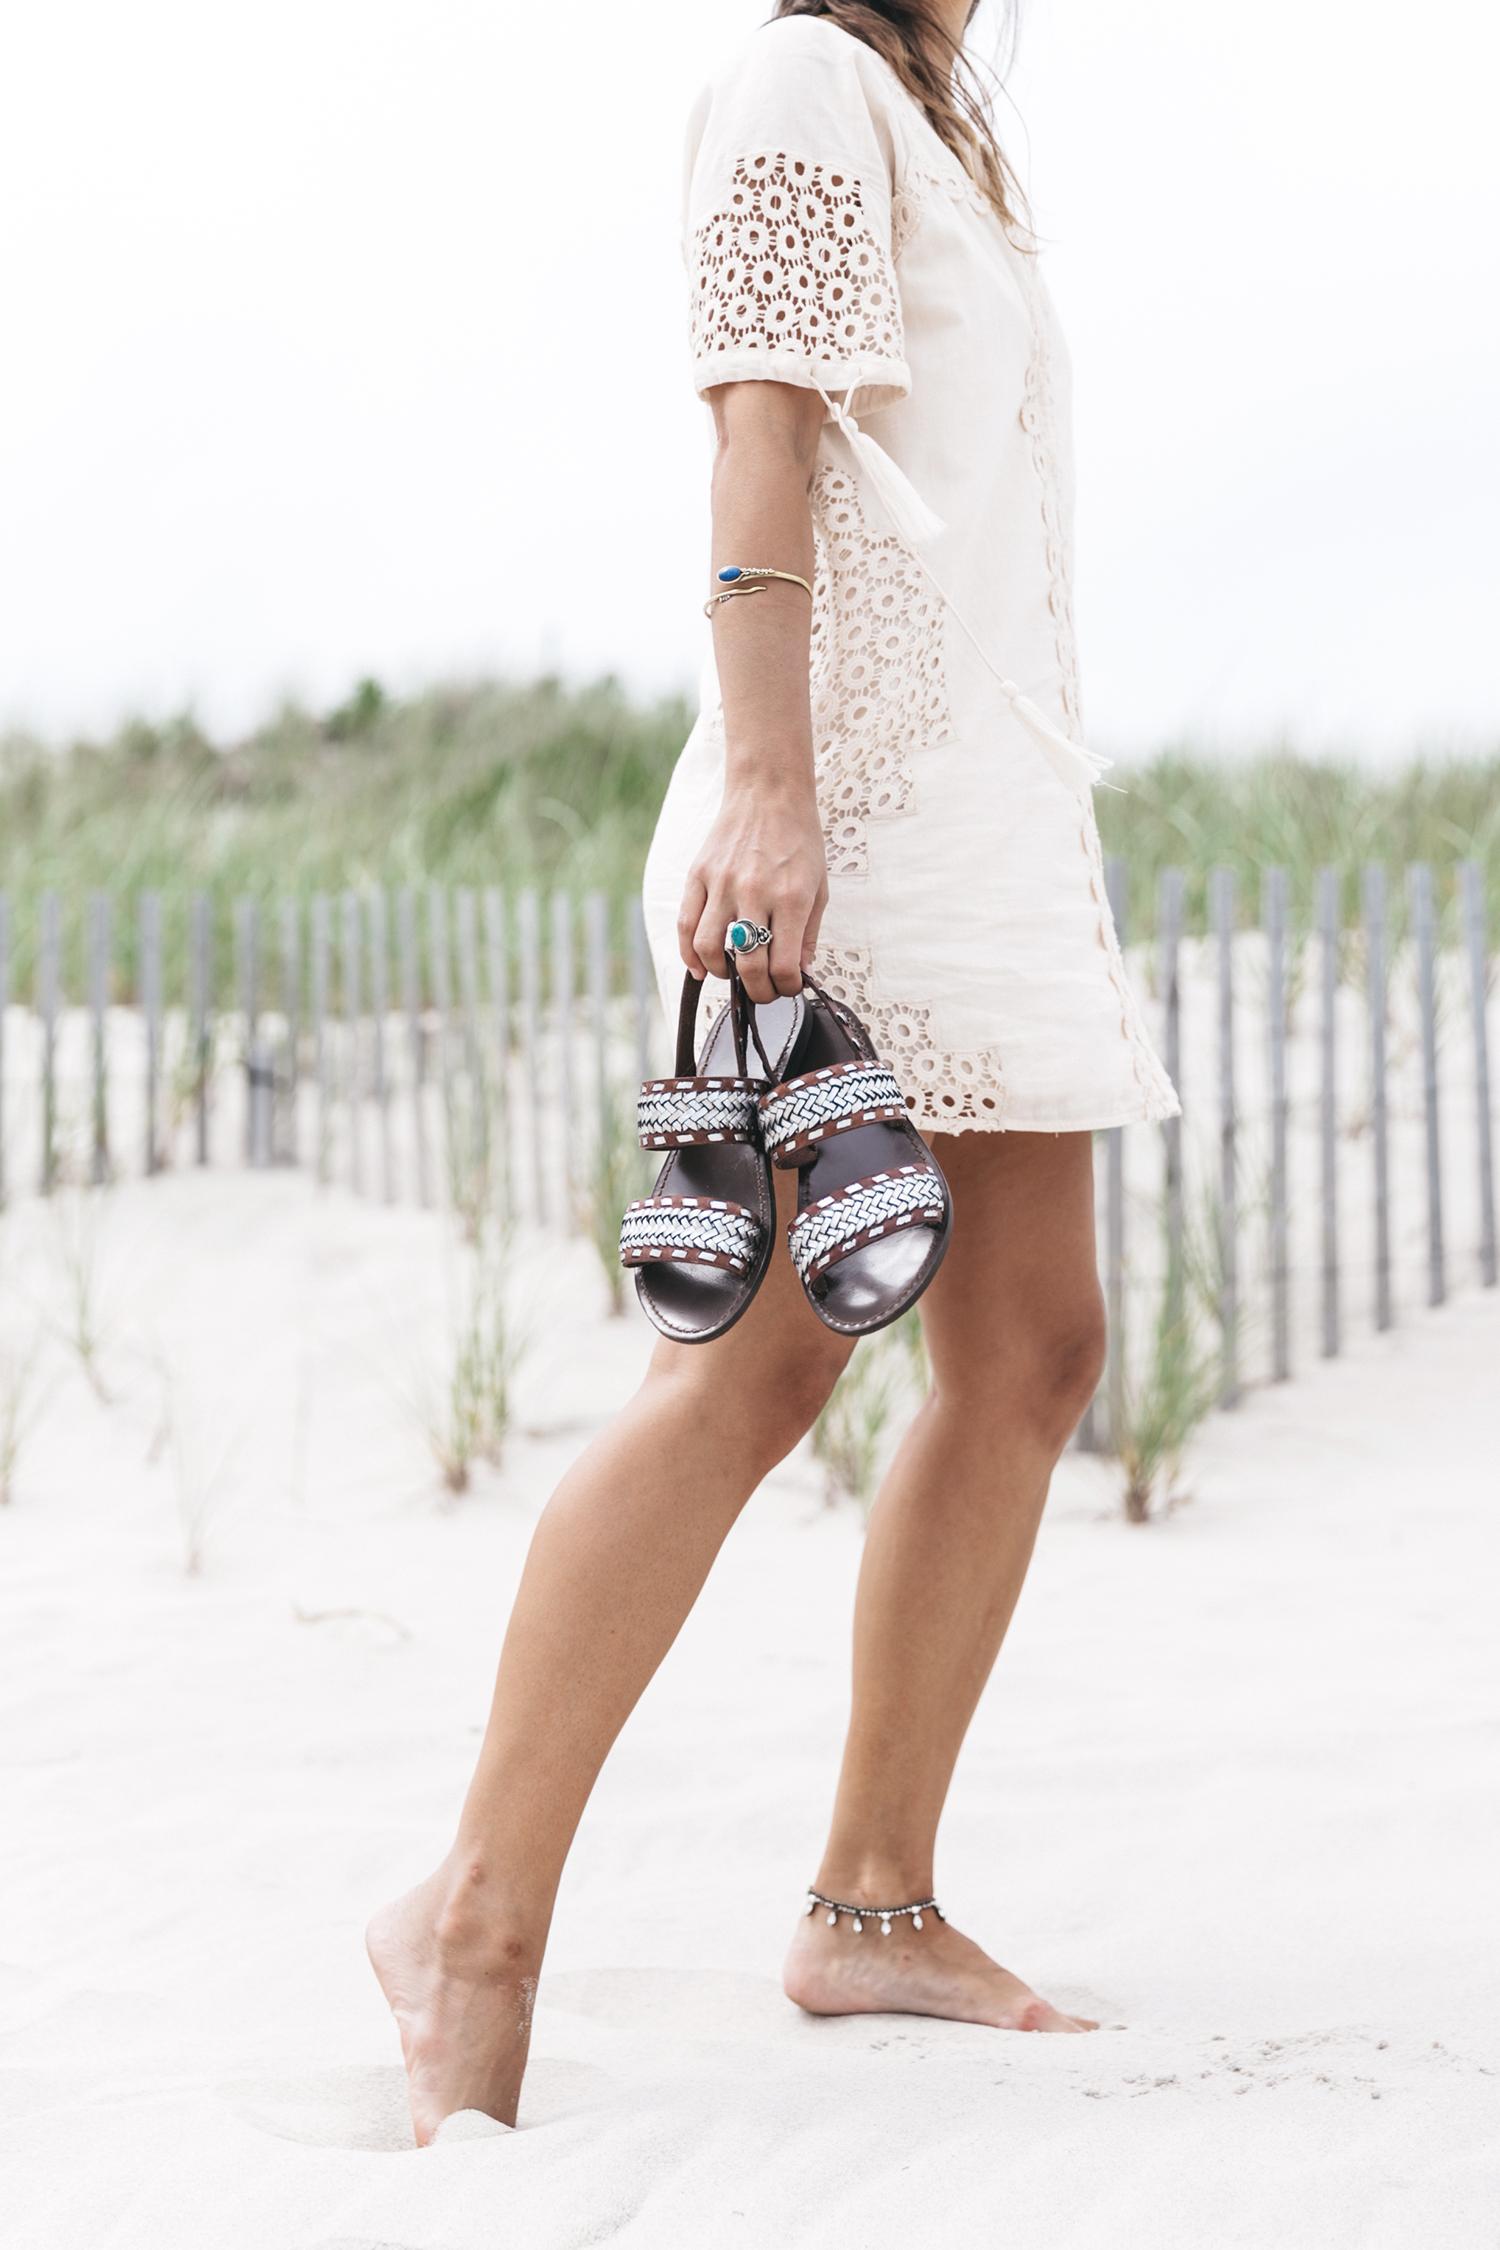 Revolve_in_The_Hamptons-Revolve_Clothing-Collage_Vintage-Cream_Dress-Tularosa-Canotier-23